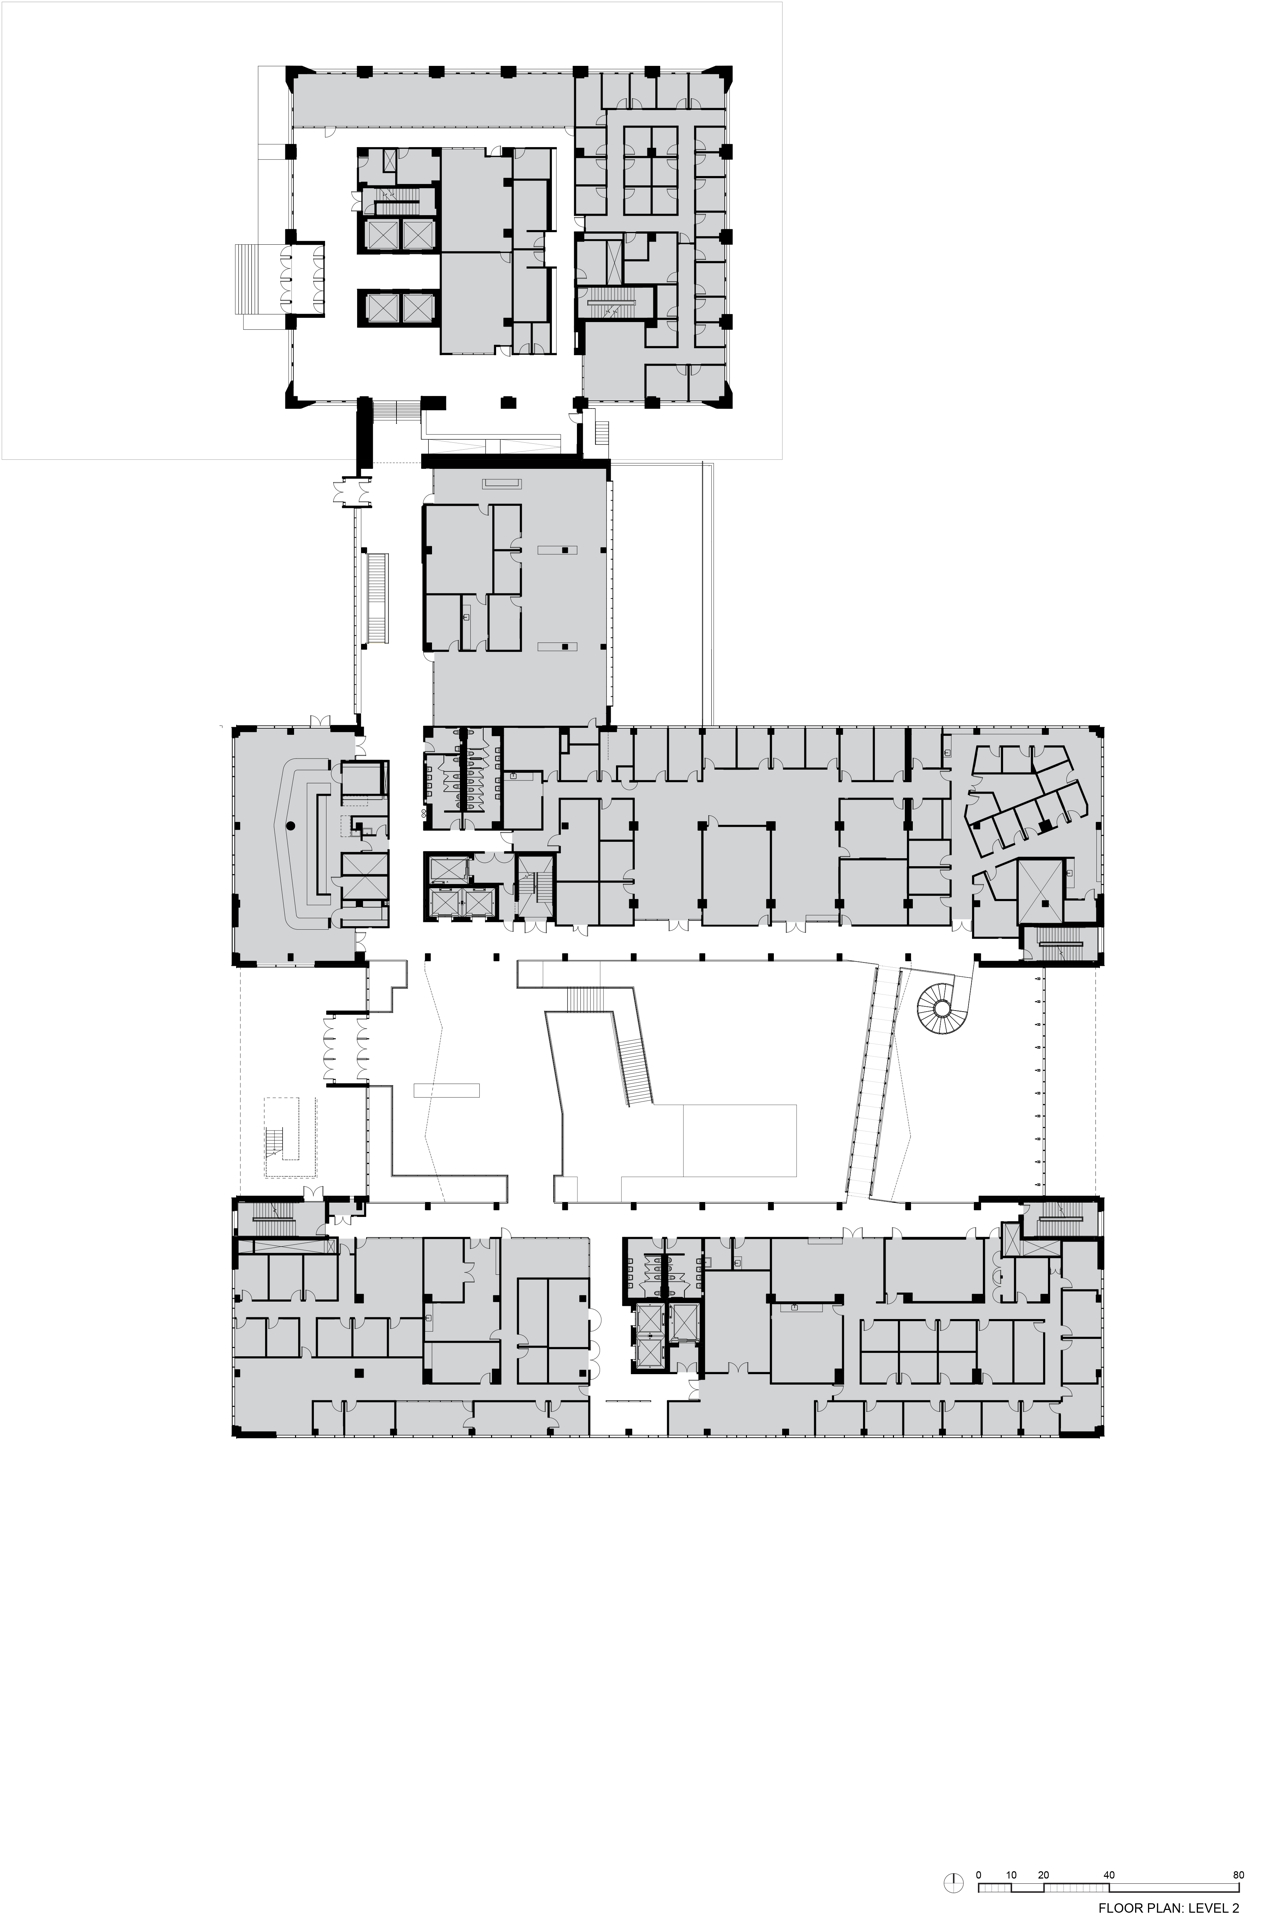 Ennead Architects Jacobs Eerc University Of Texas Austin Floornature Whitehead Gas Valve Wiring Diagram